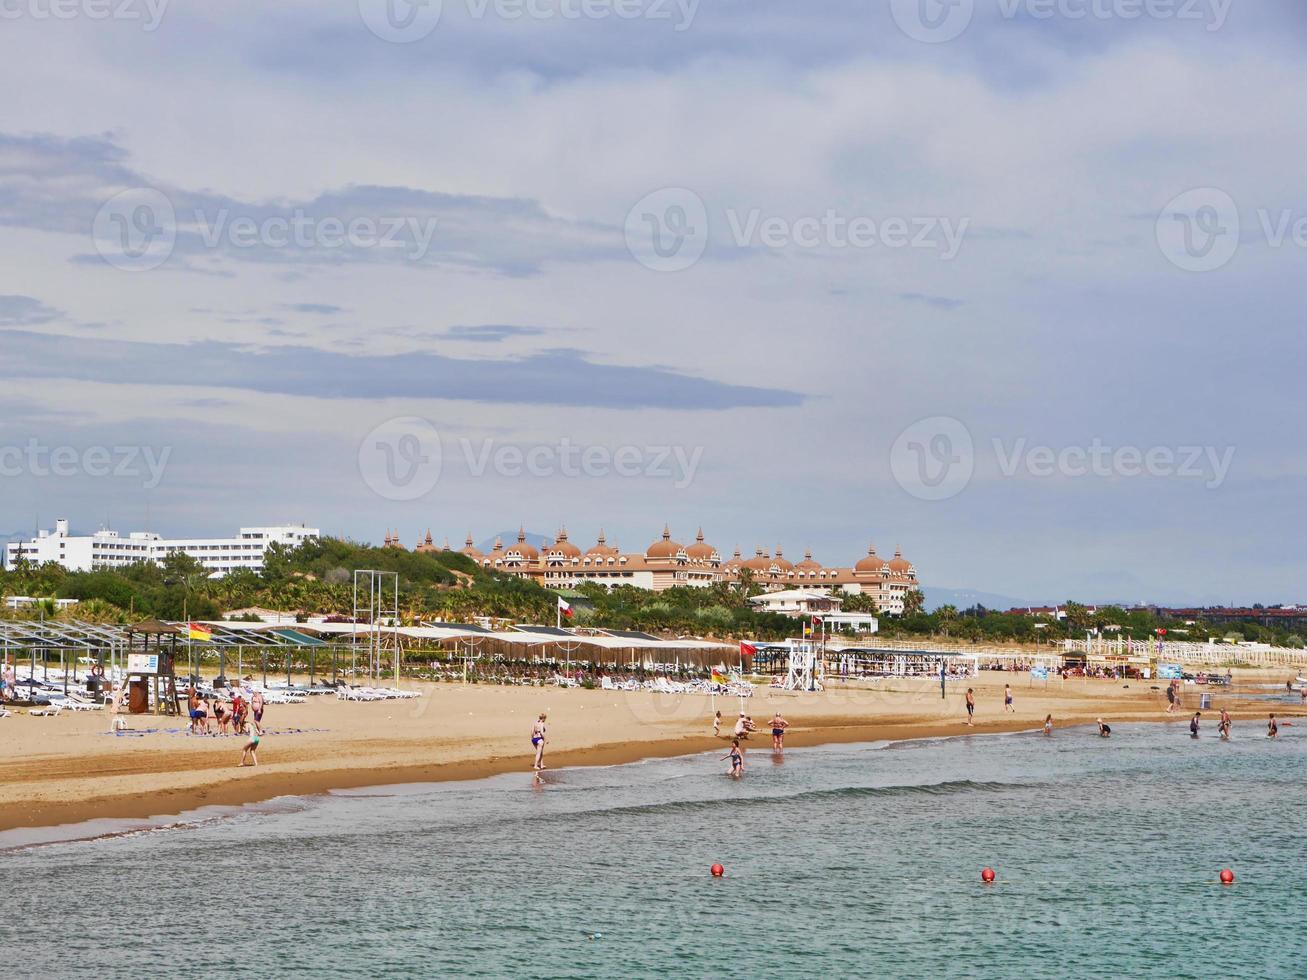 Turkish beach and big hotels on the background. Antalya city, Turkey. May 2017 photo